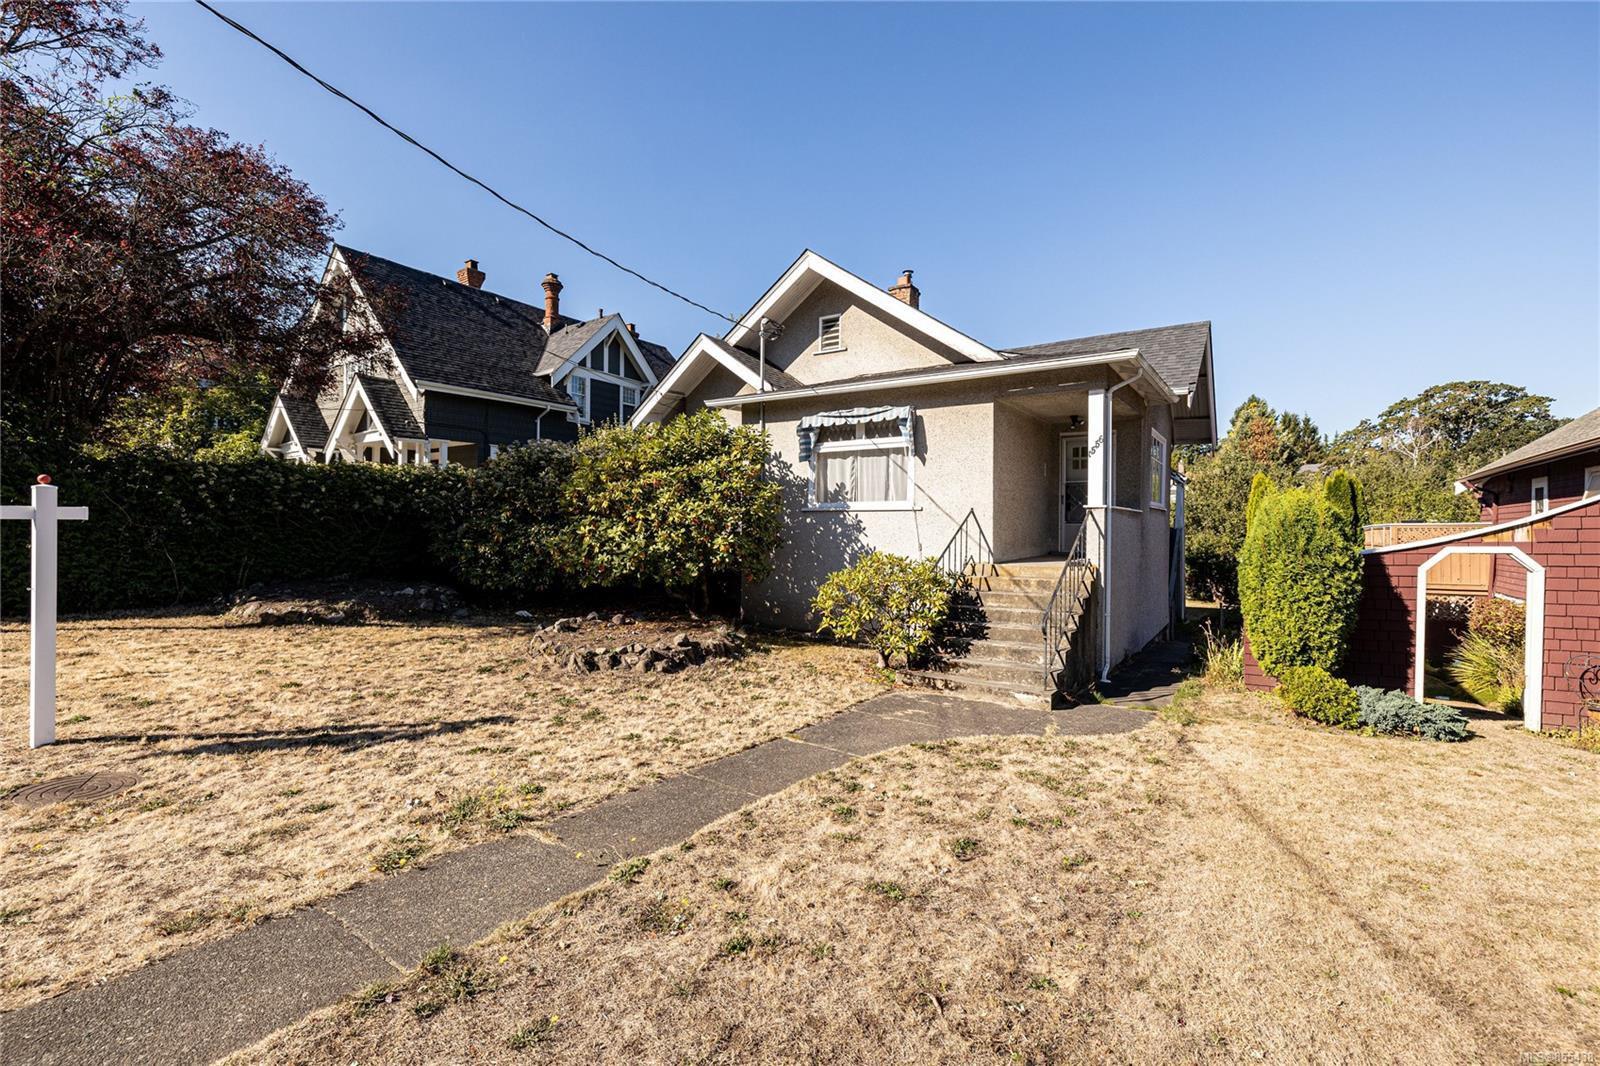 Main Photo: 1556 Monterey Ave in : OB North Oak Bay House for sale (Oak Bay)  : MLS®# 855438